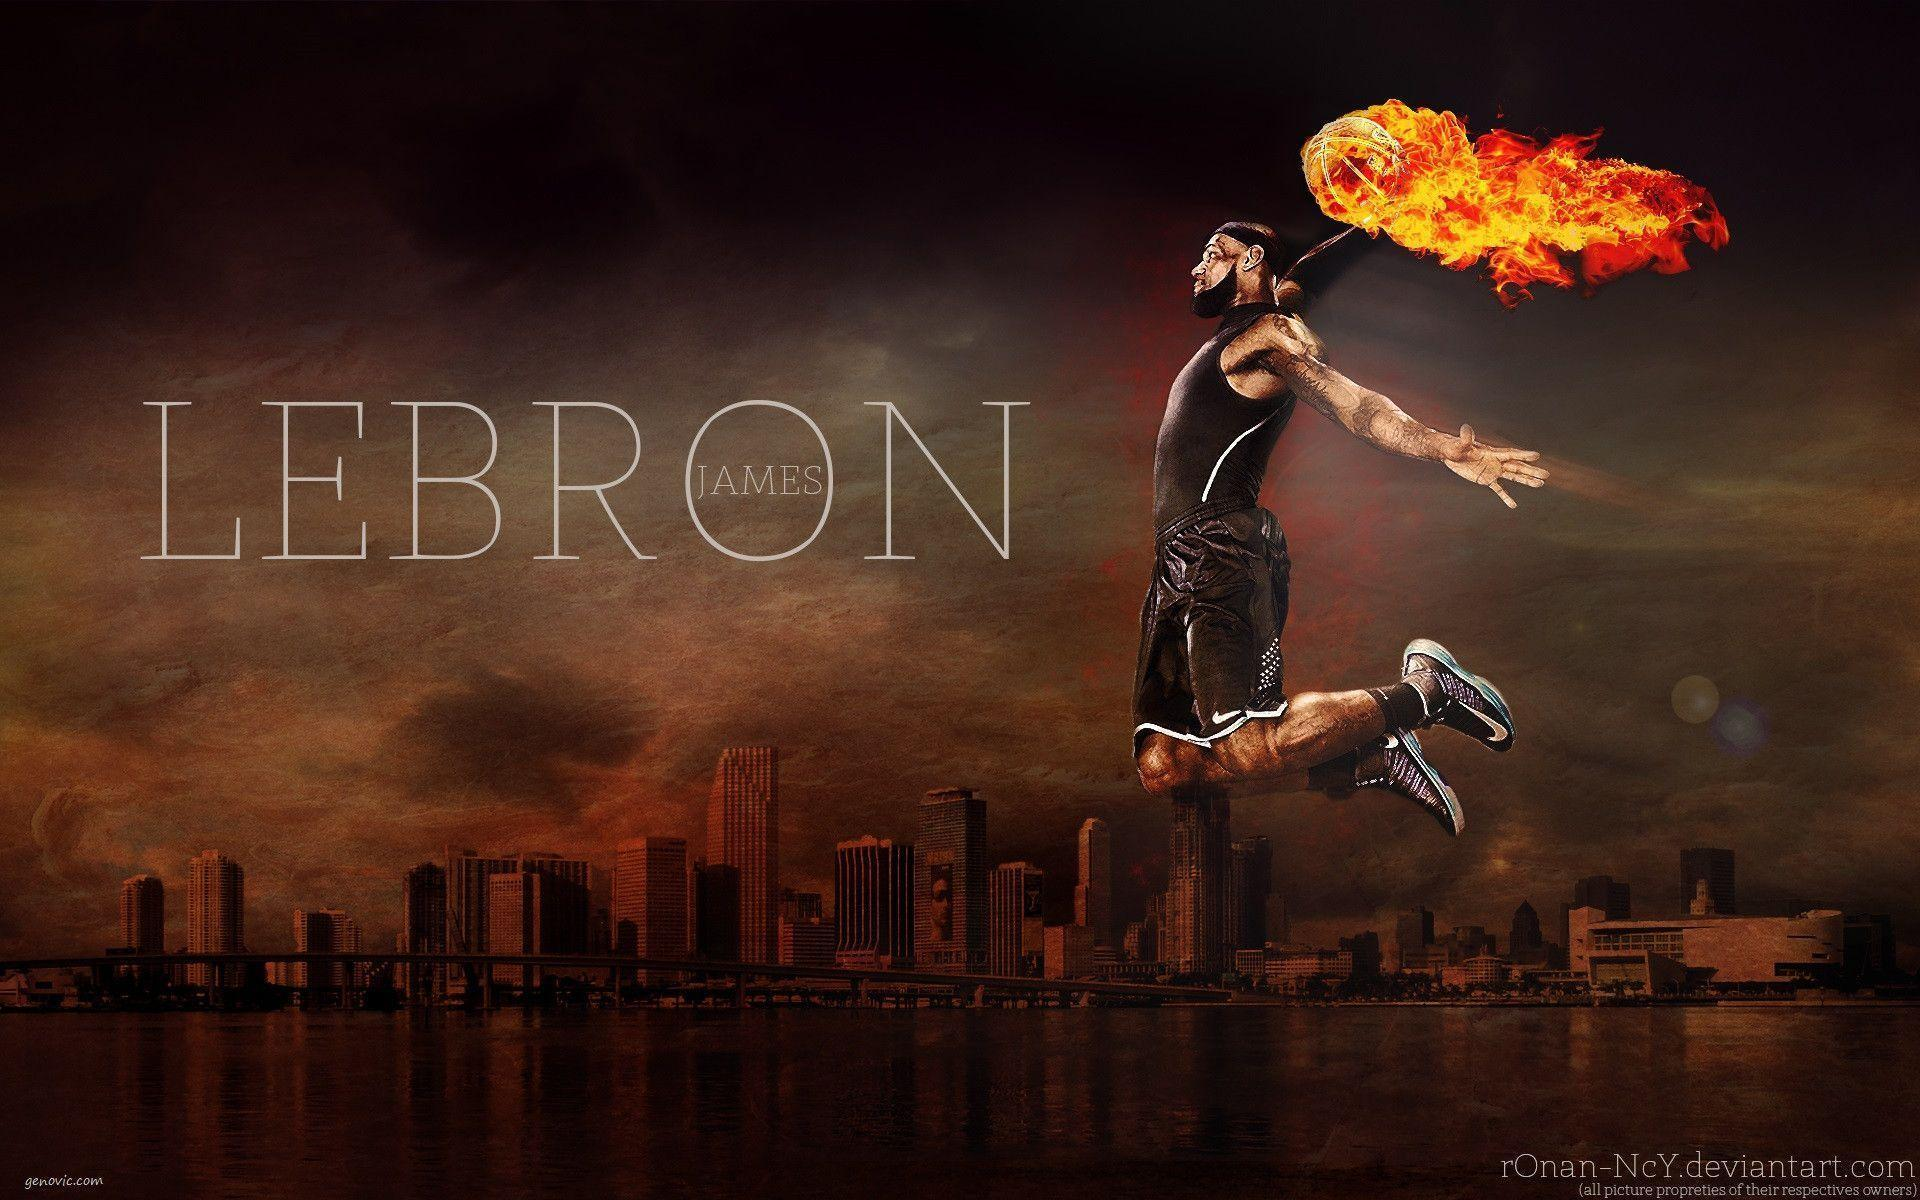 lebron james logo wallpaper - photo #28